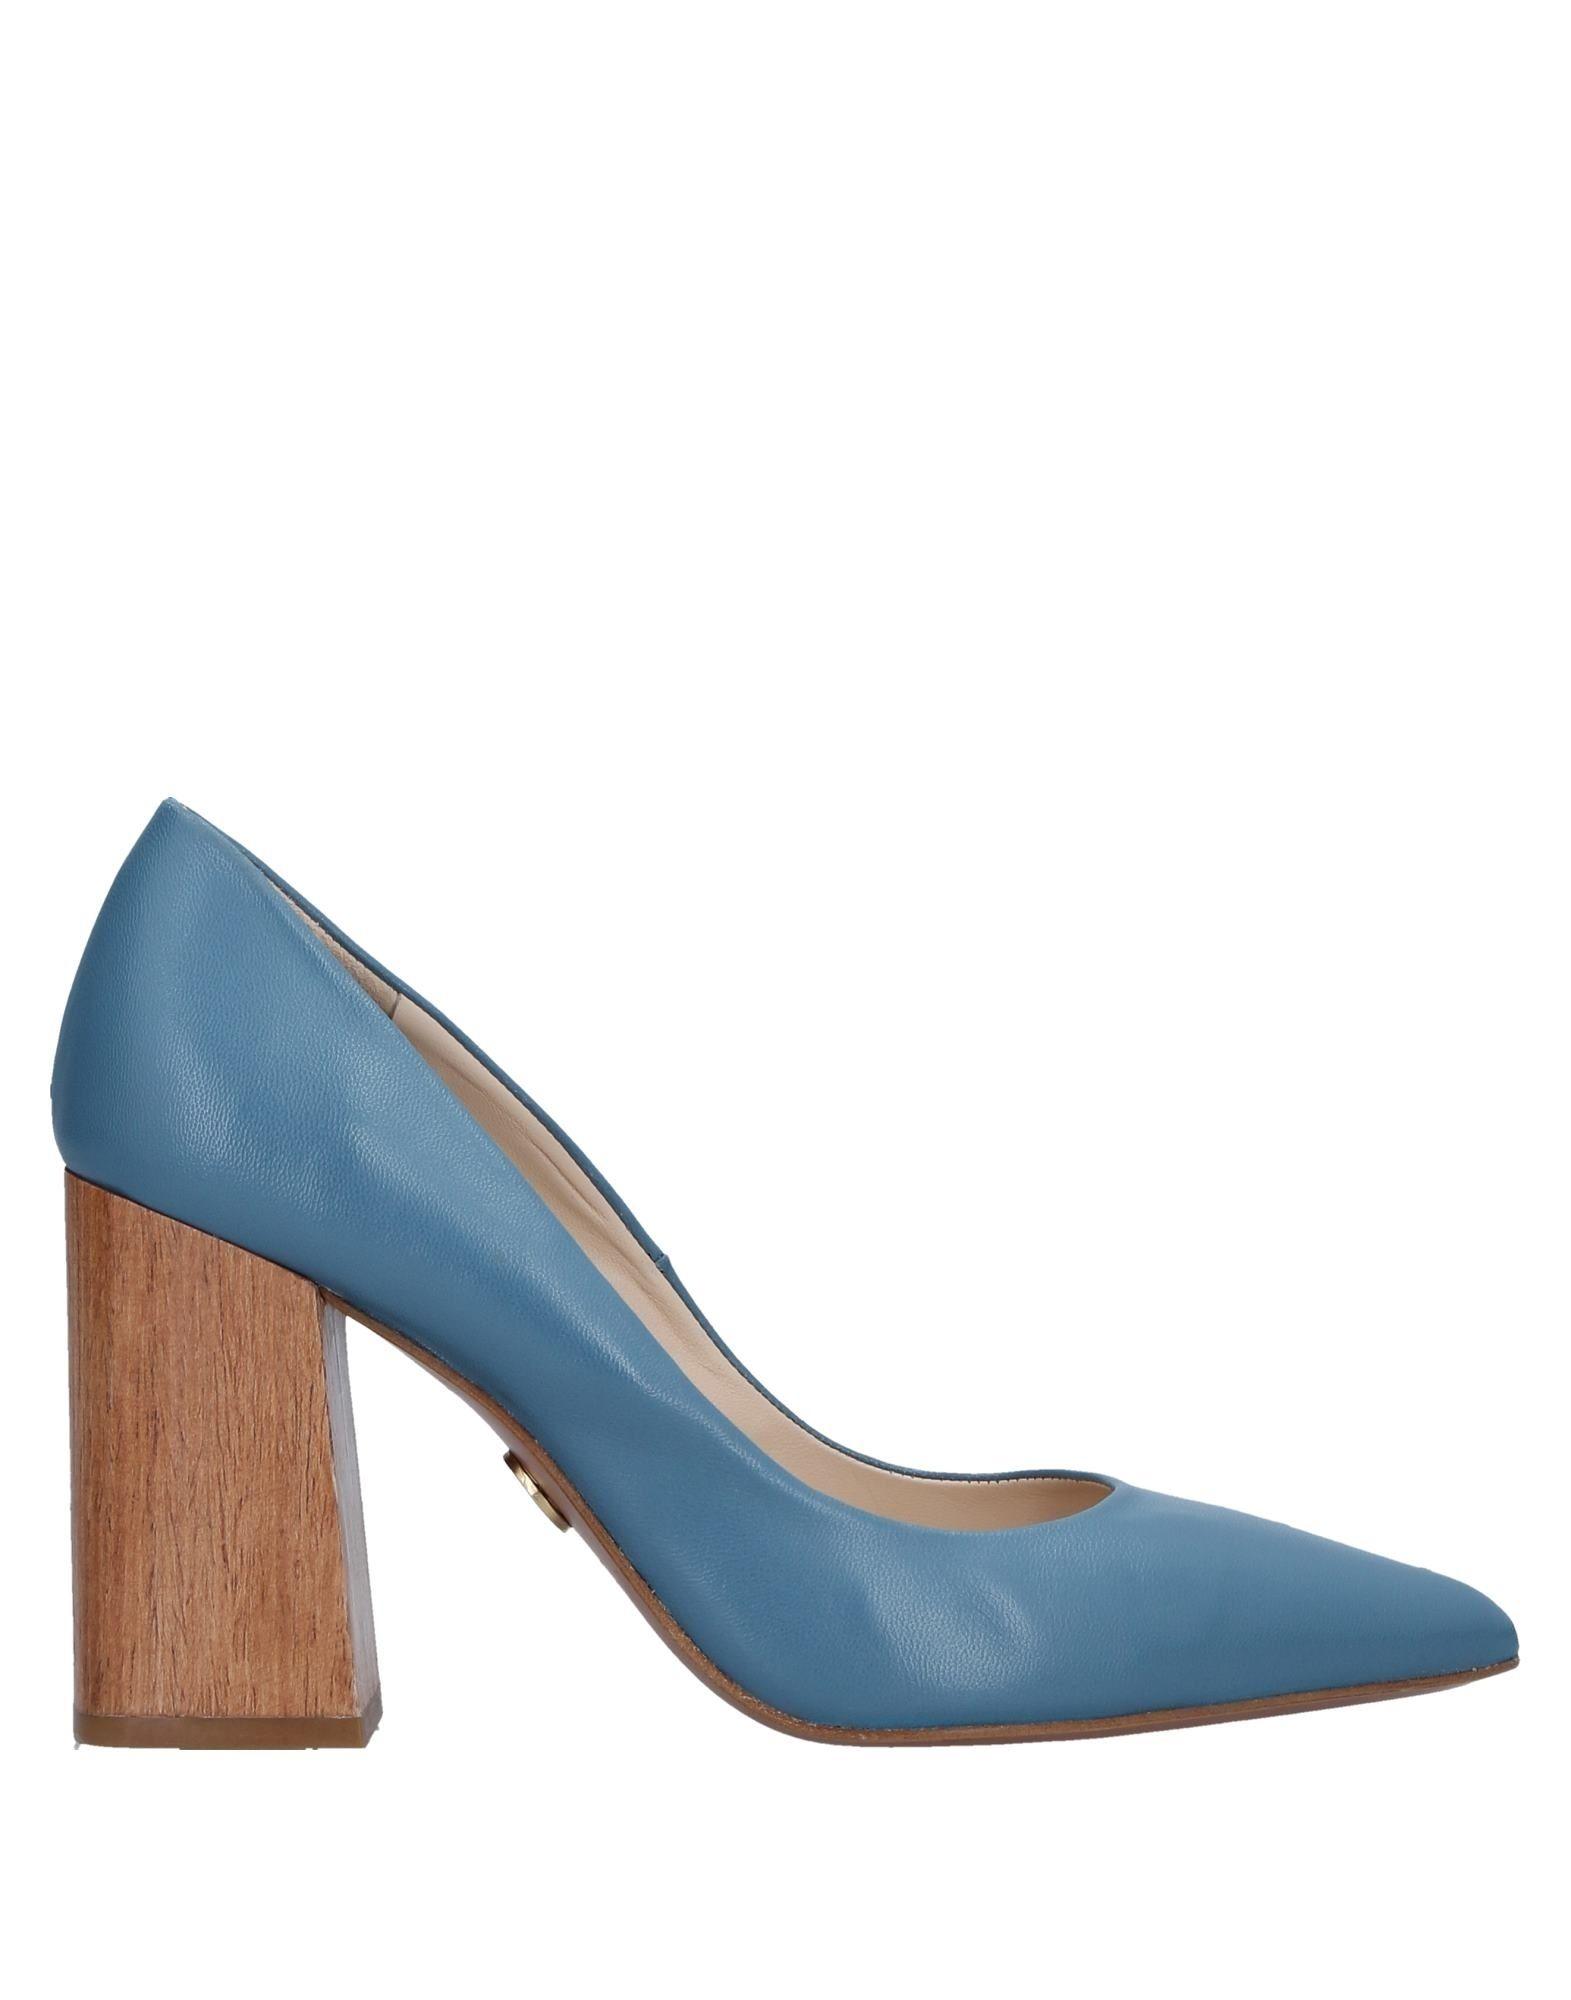 Leie Pumps Damen  11533748ML Gute Qualität beliebte Schuhe